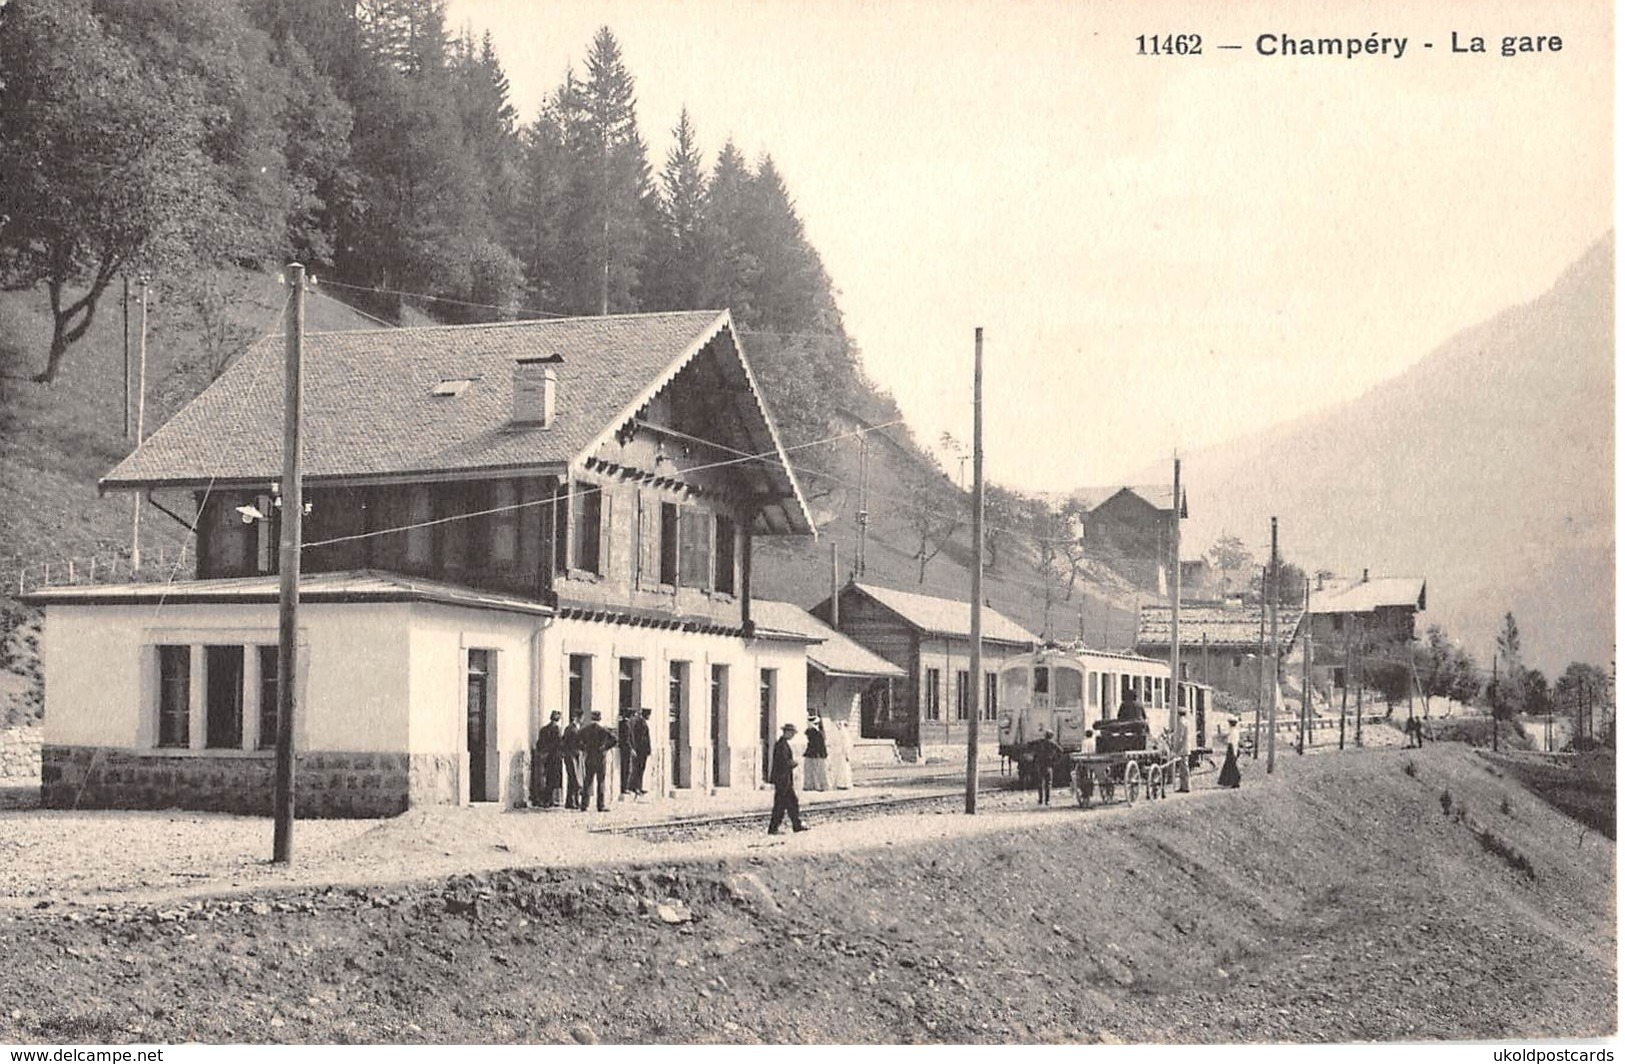 CPA  Suisse, CHAMPERY, La Gare - Train At Railway Station - VS Valais